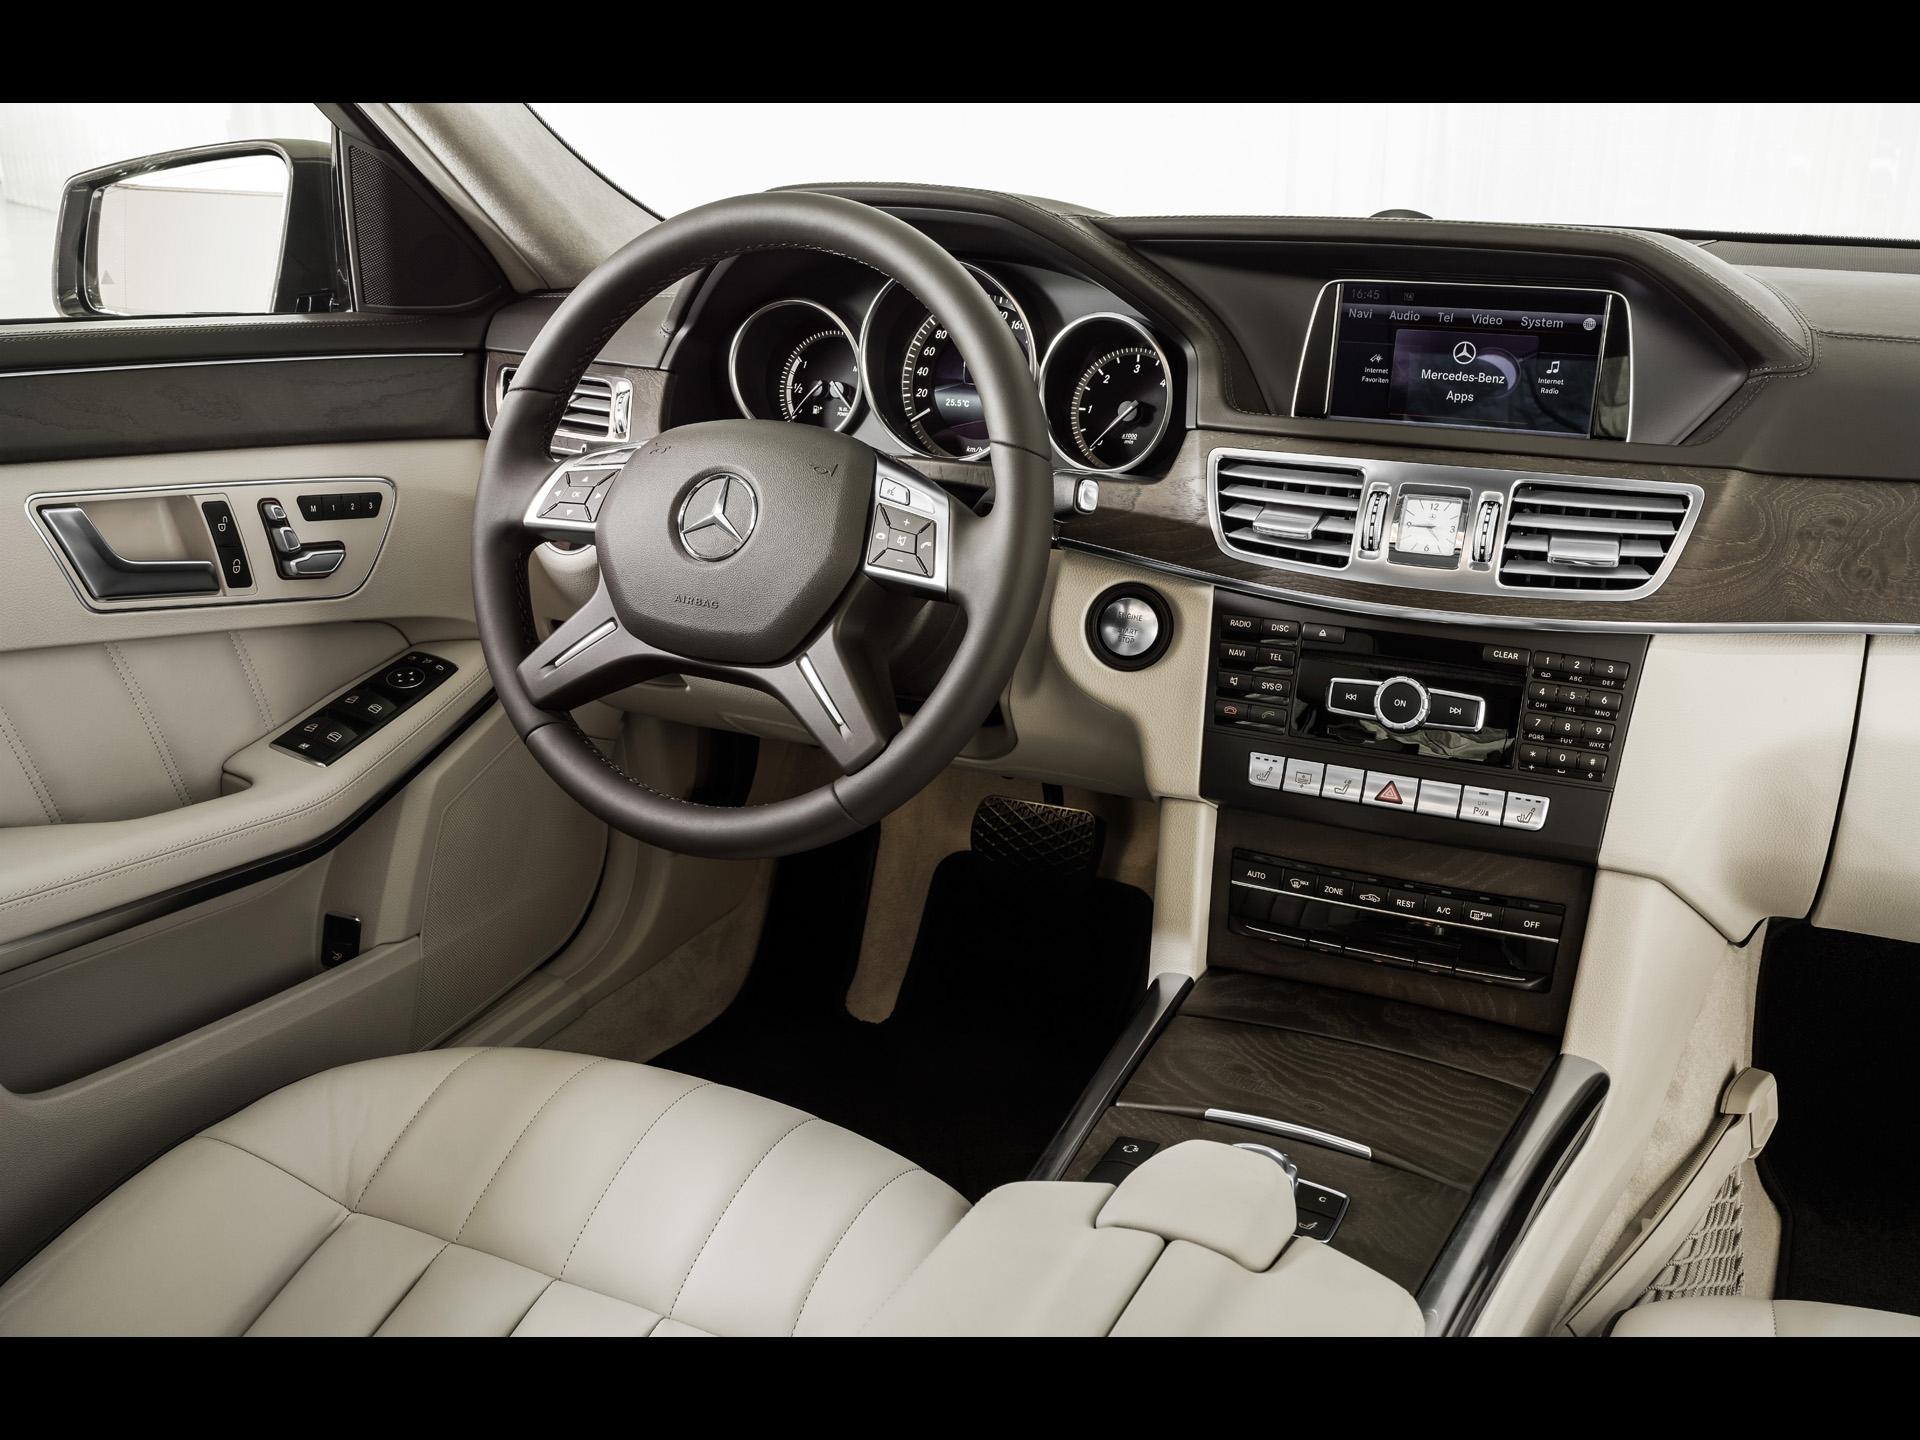 mercedes invoice price 2013 mercedes benz e class interior 1 1920x1440 1920 X 1440